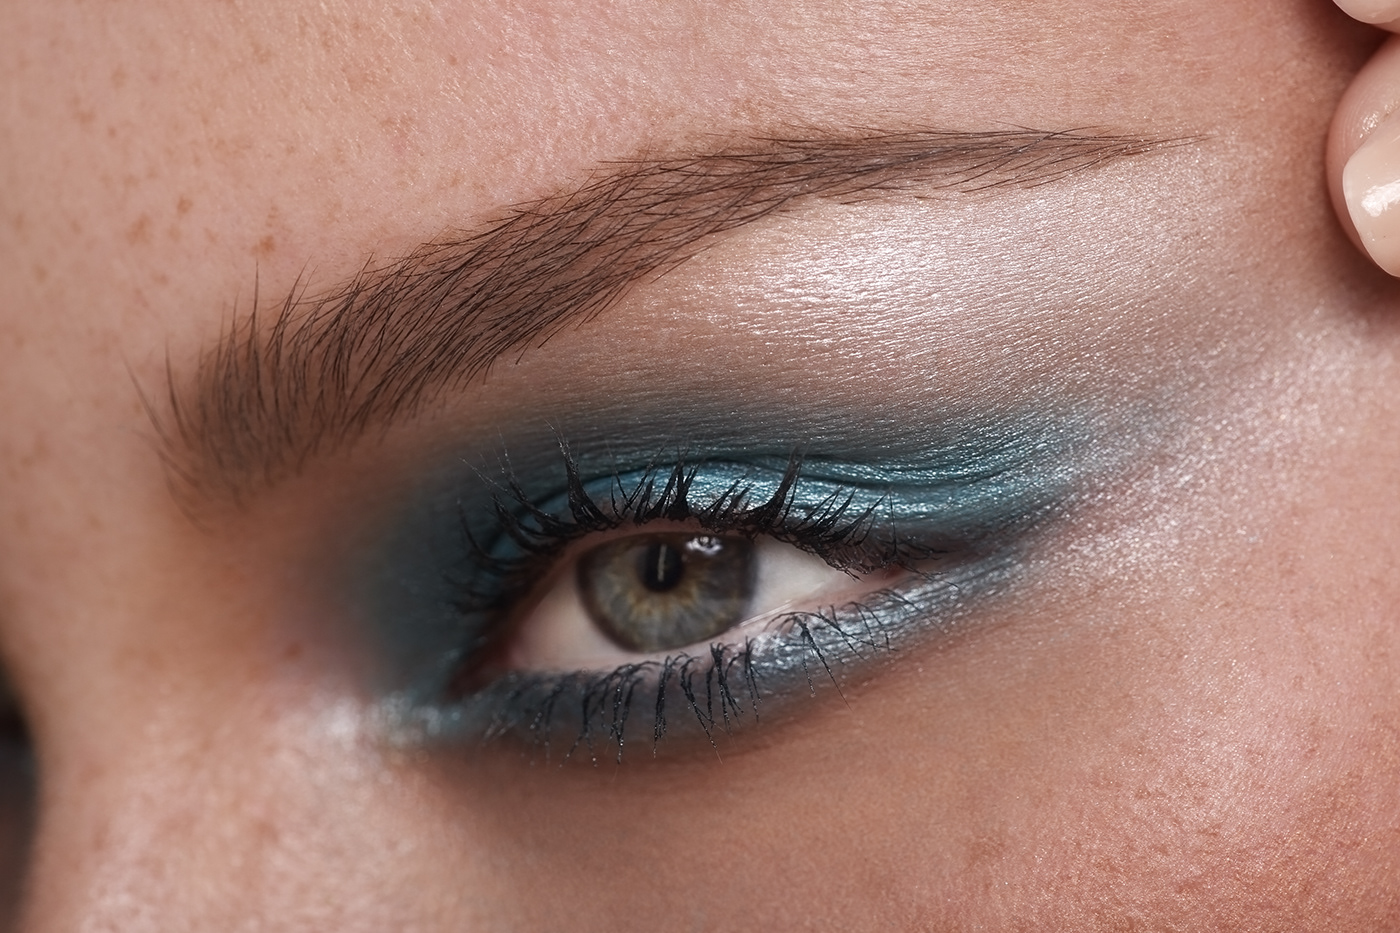 Image may contain: person, cosmetics and eyelash